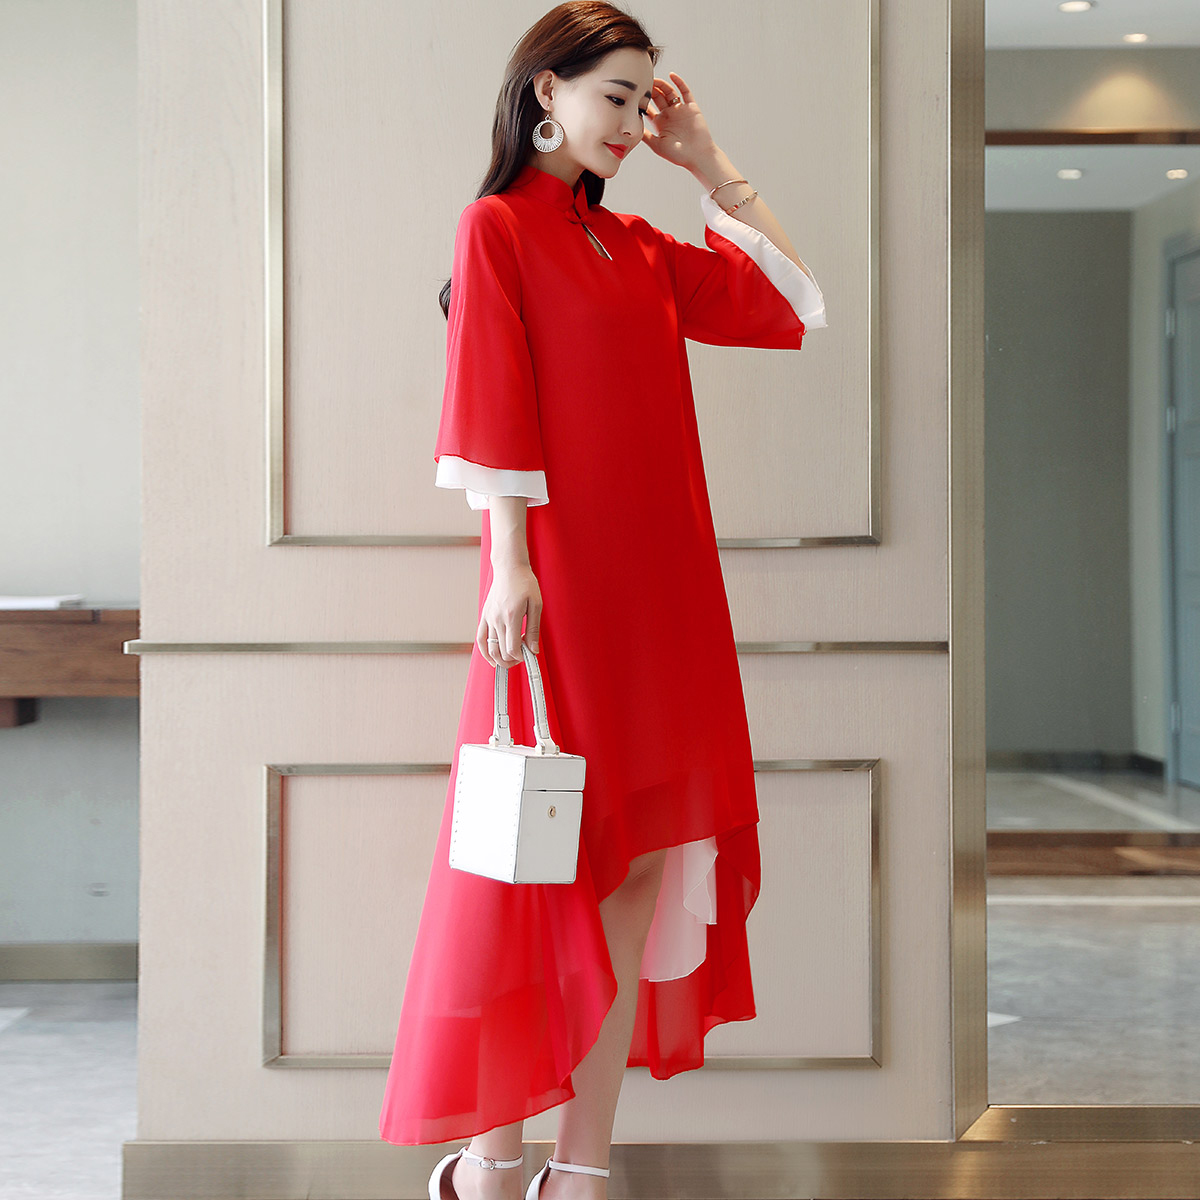 2019 Asian Dress Ao Dai Vietnam Clothing Vintage Clothing Ao Dai Vietnam For Woman Improved Aodai Party Dress